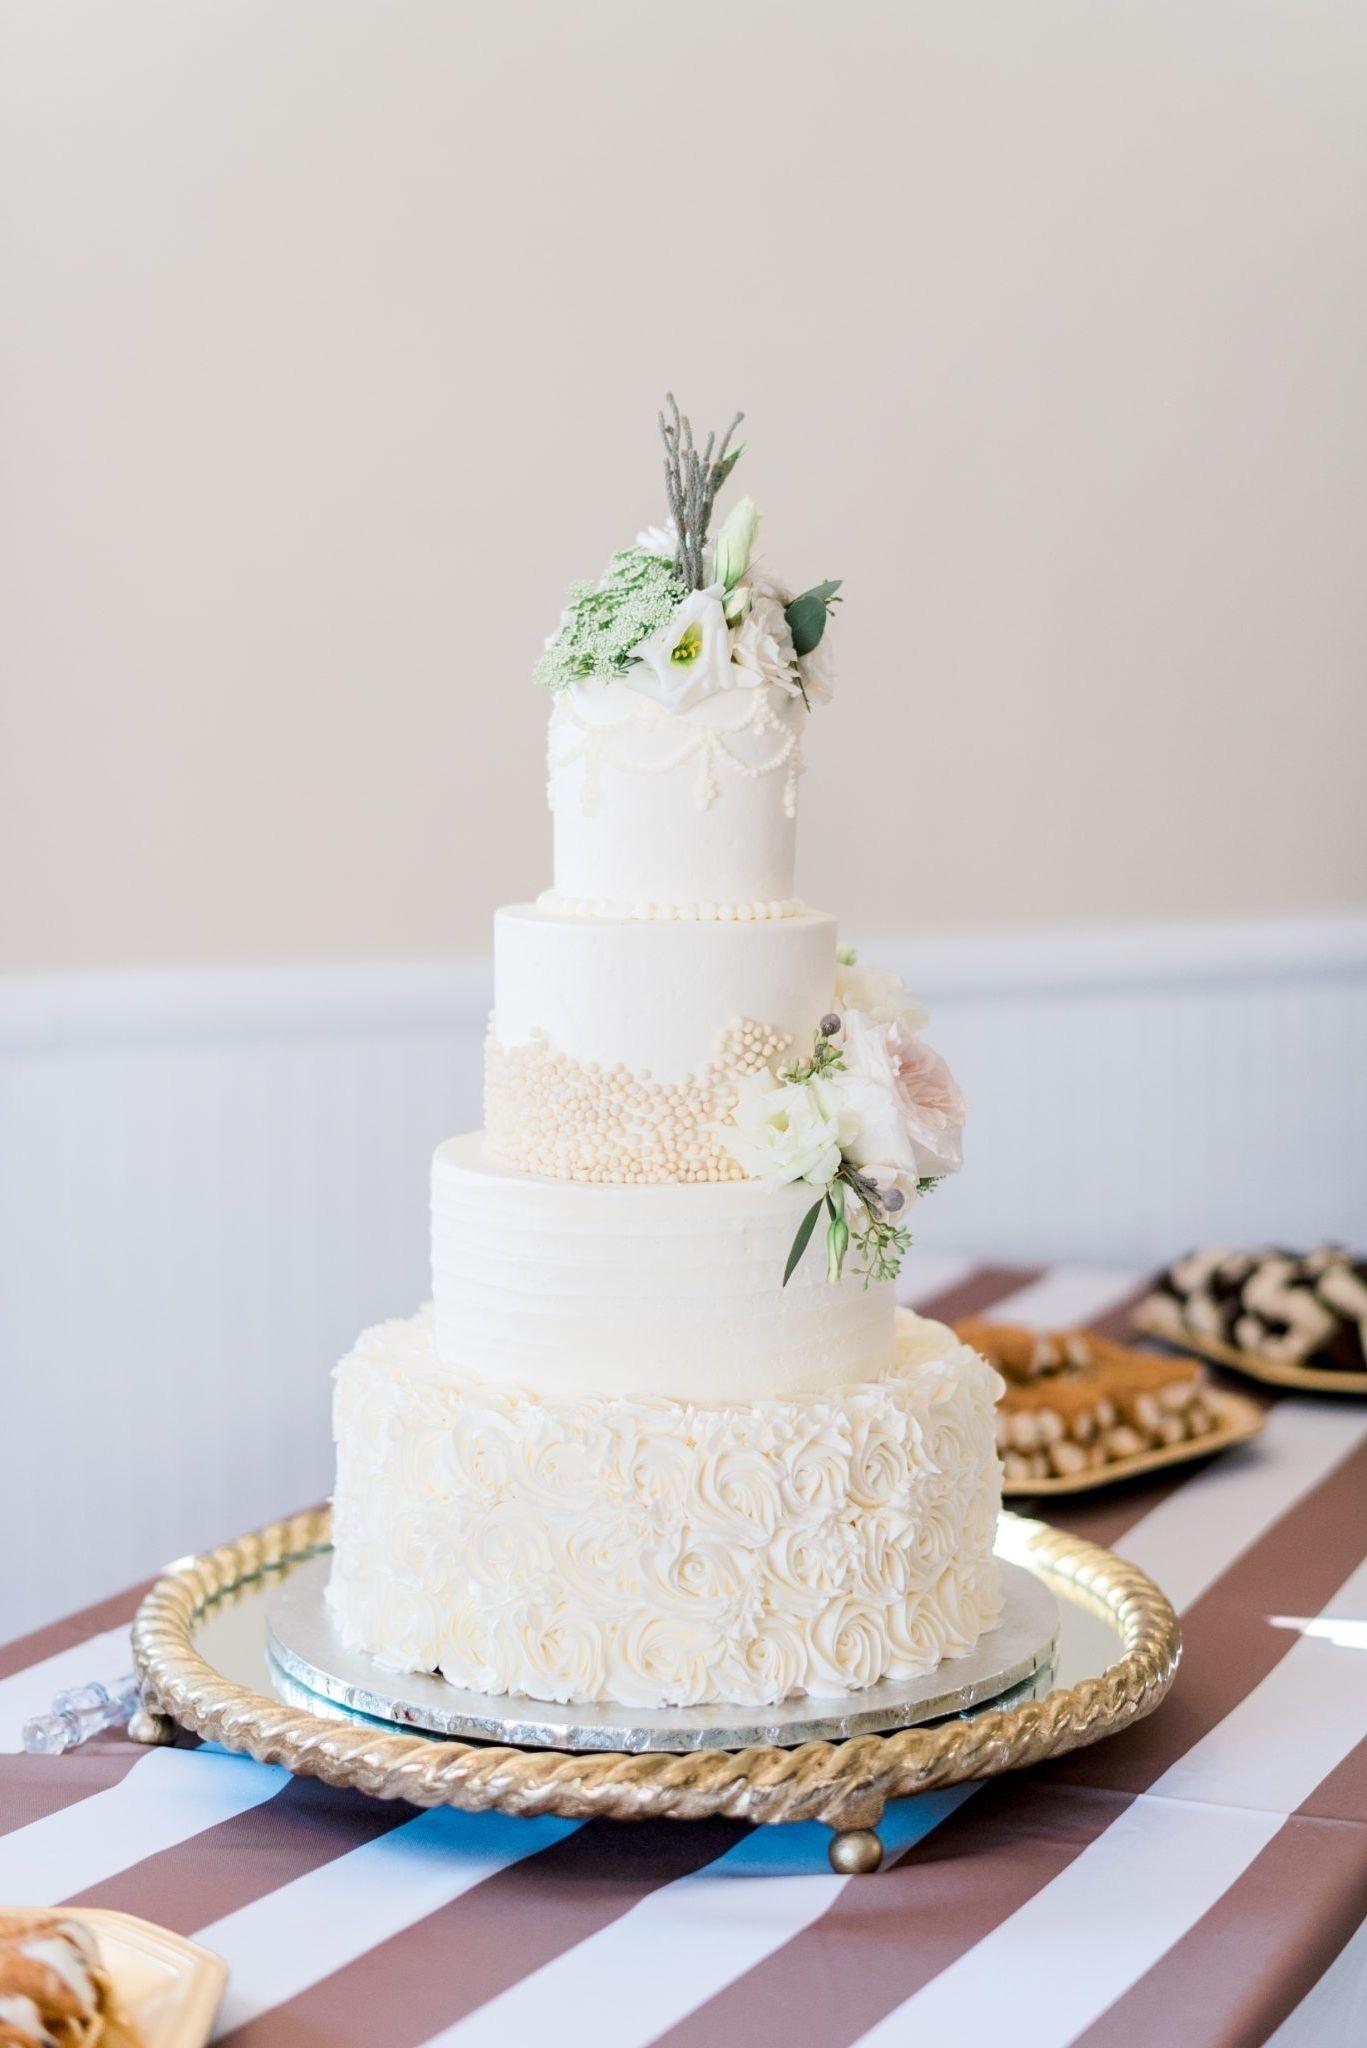 Whole Foods Wedding Cakes Wilmington Nc Wedding Cakes Whole Food Recipes Cake